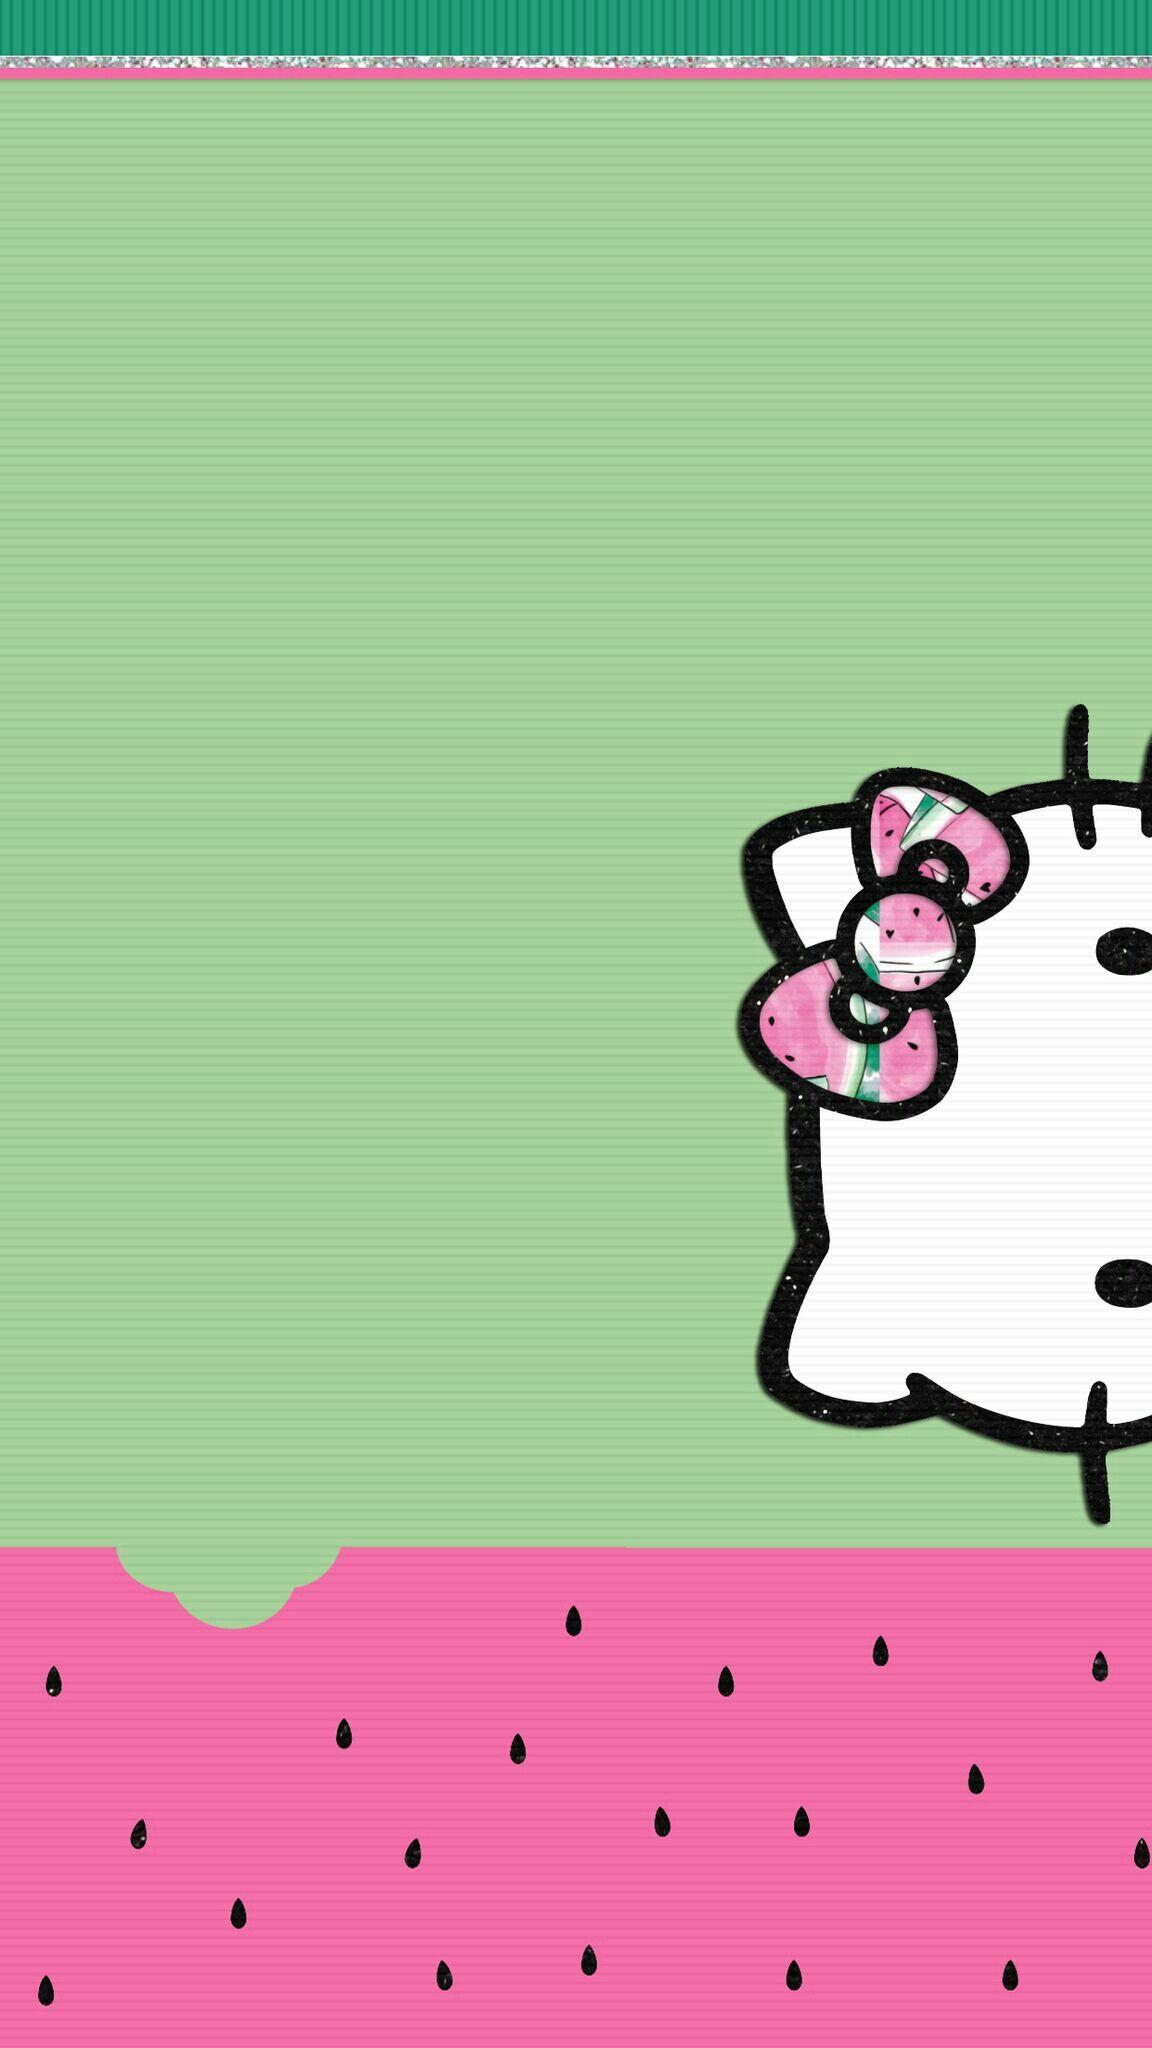 Great Wallpaper Hello Kitty Desktop Background - fb79c04d0e93418af8a02bed055190b8  Snapshot_347652.jpg